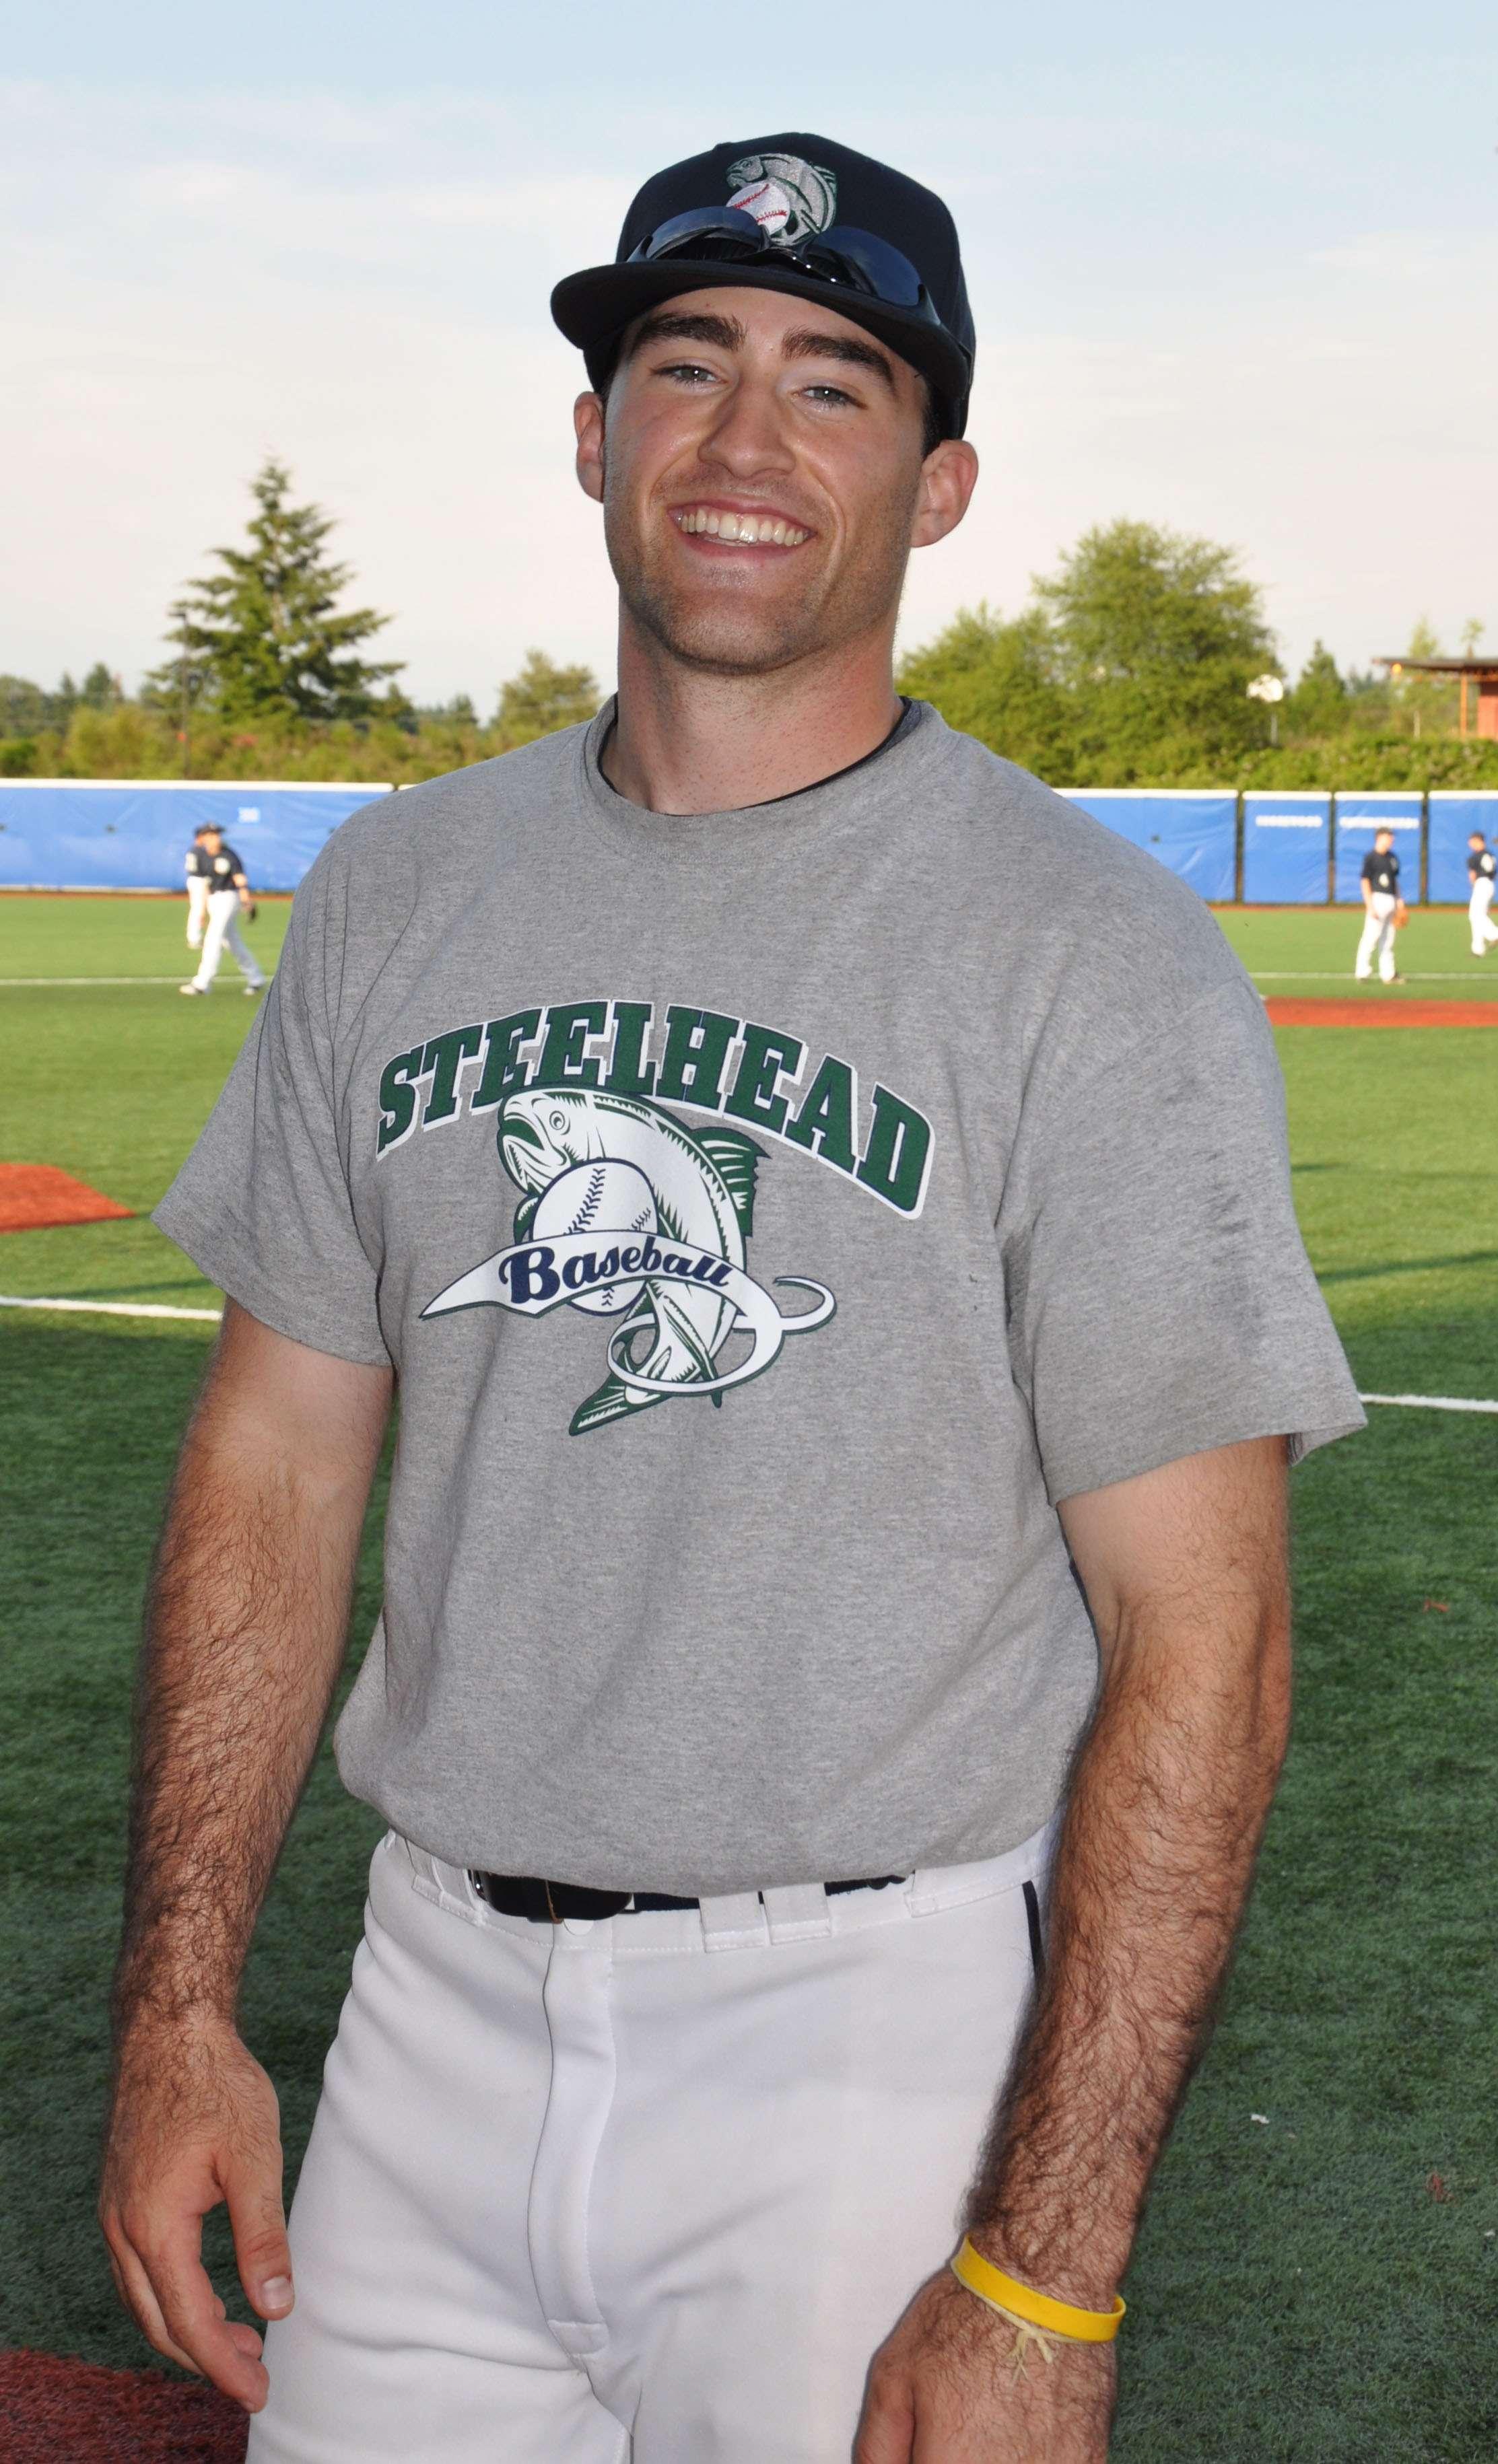 Coach Werkau